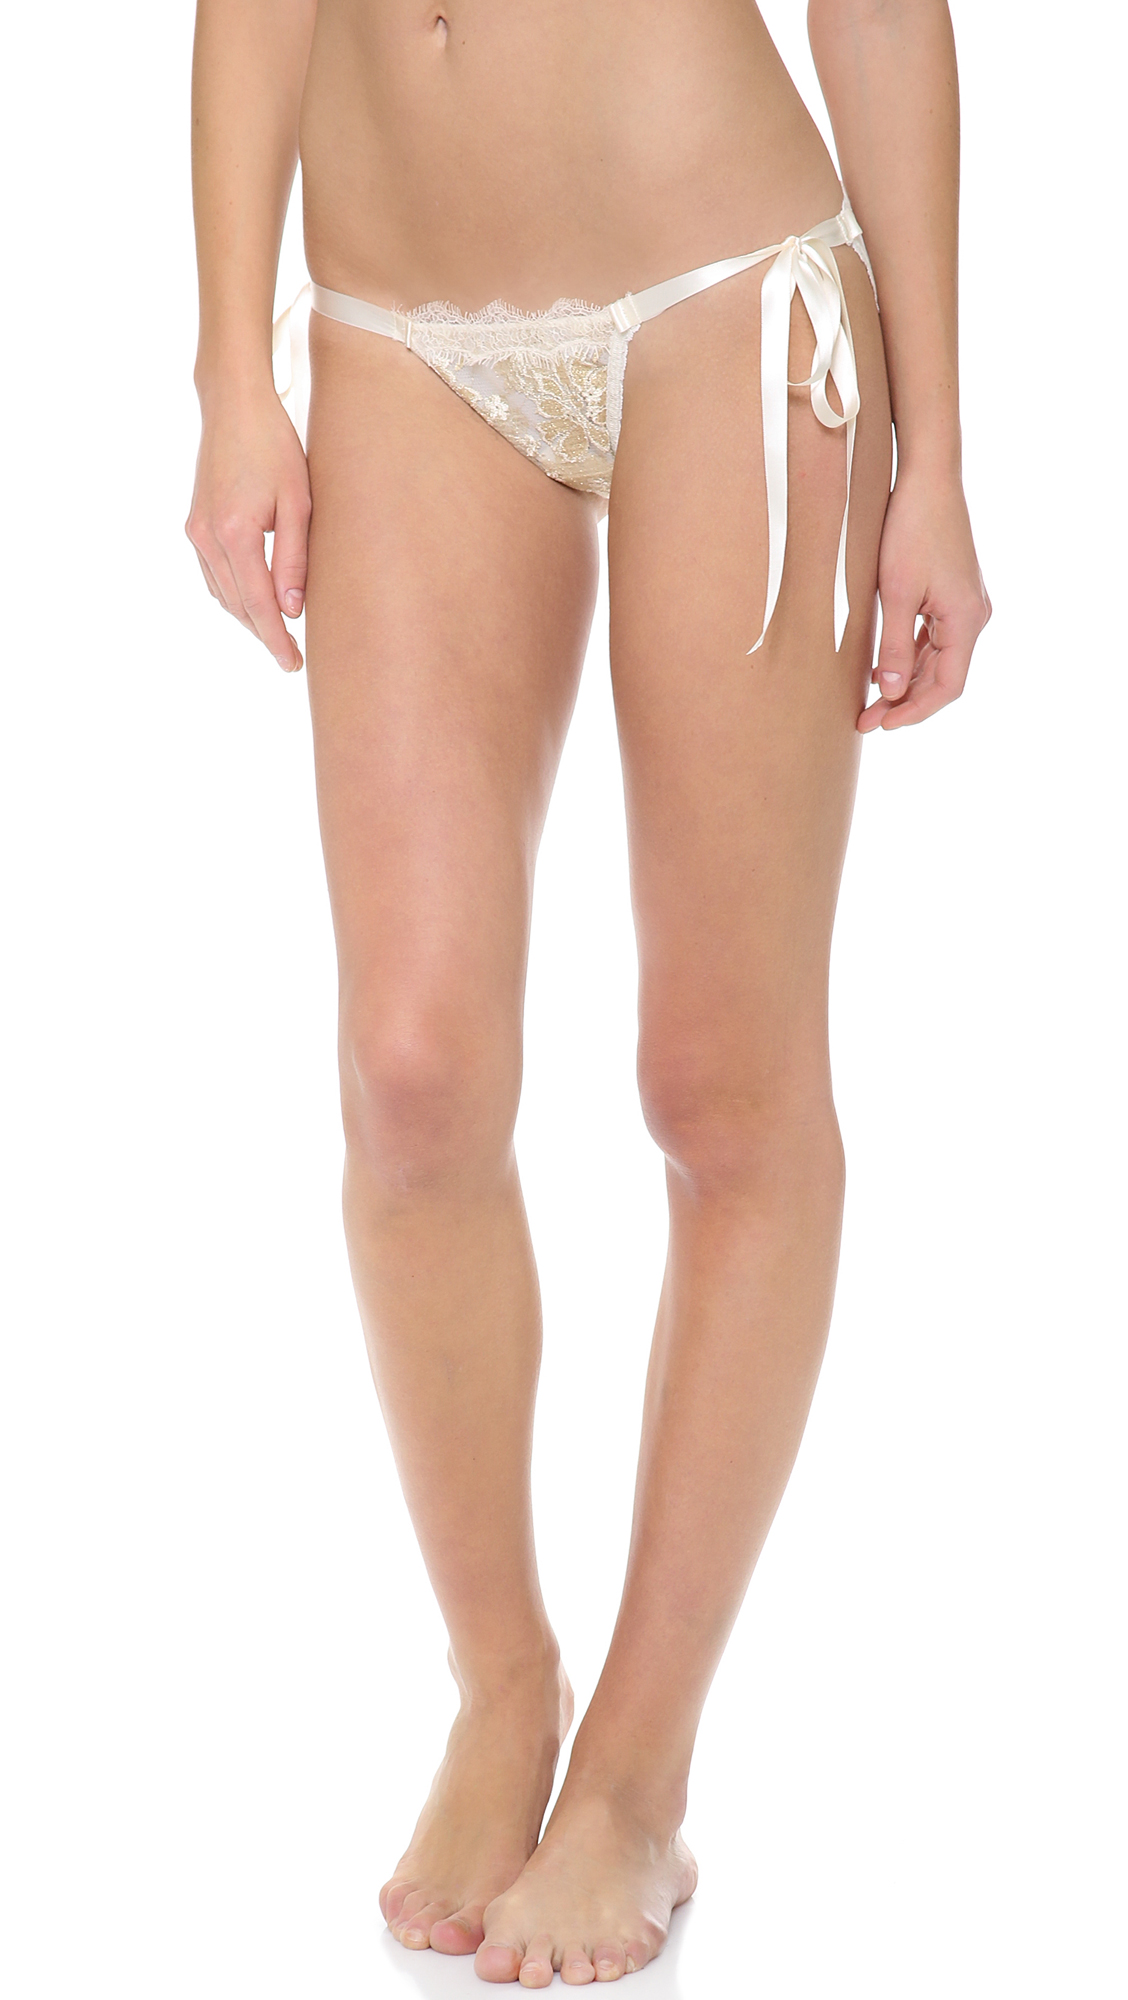 Hanky panky lace bikini